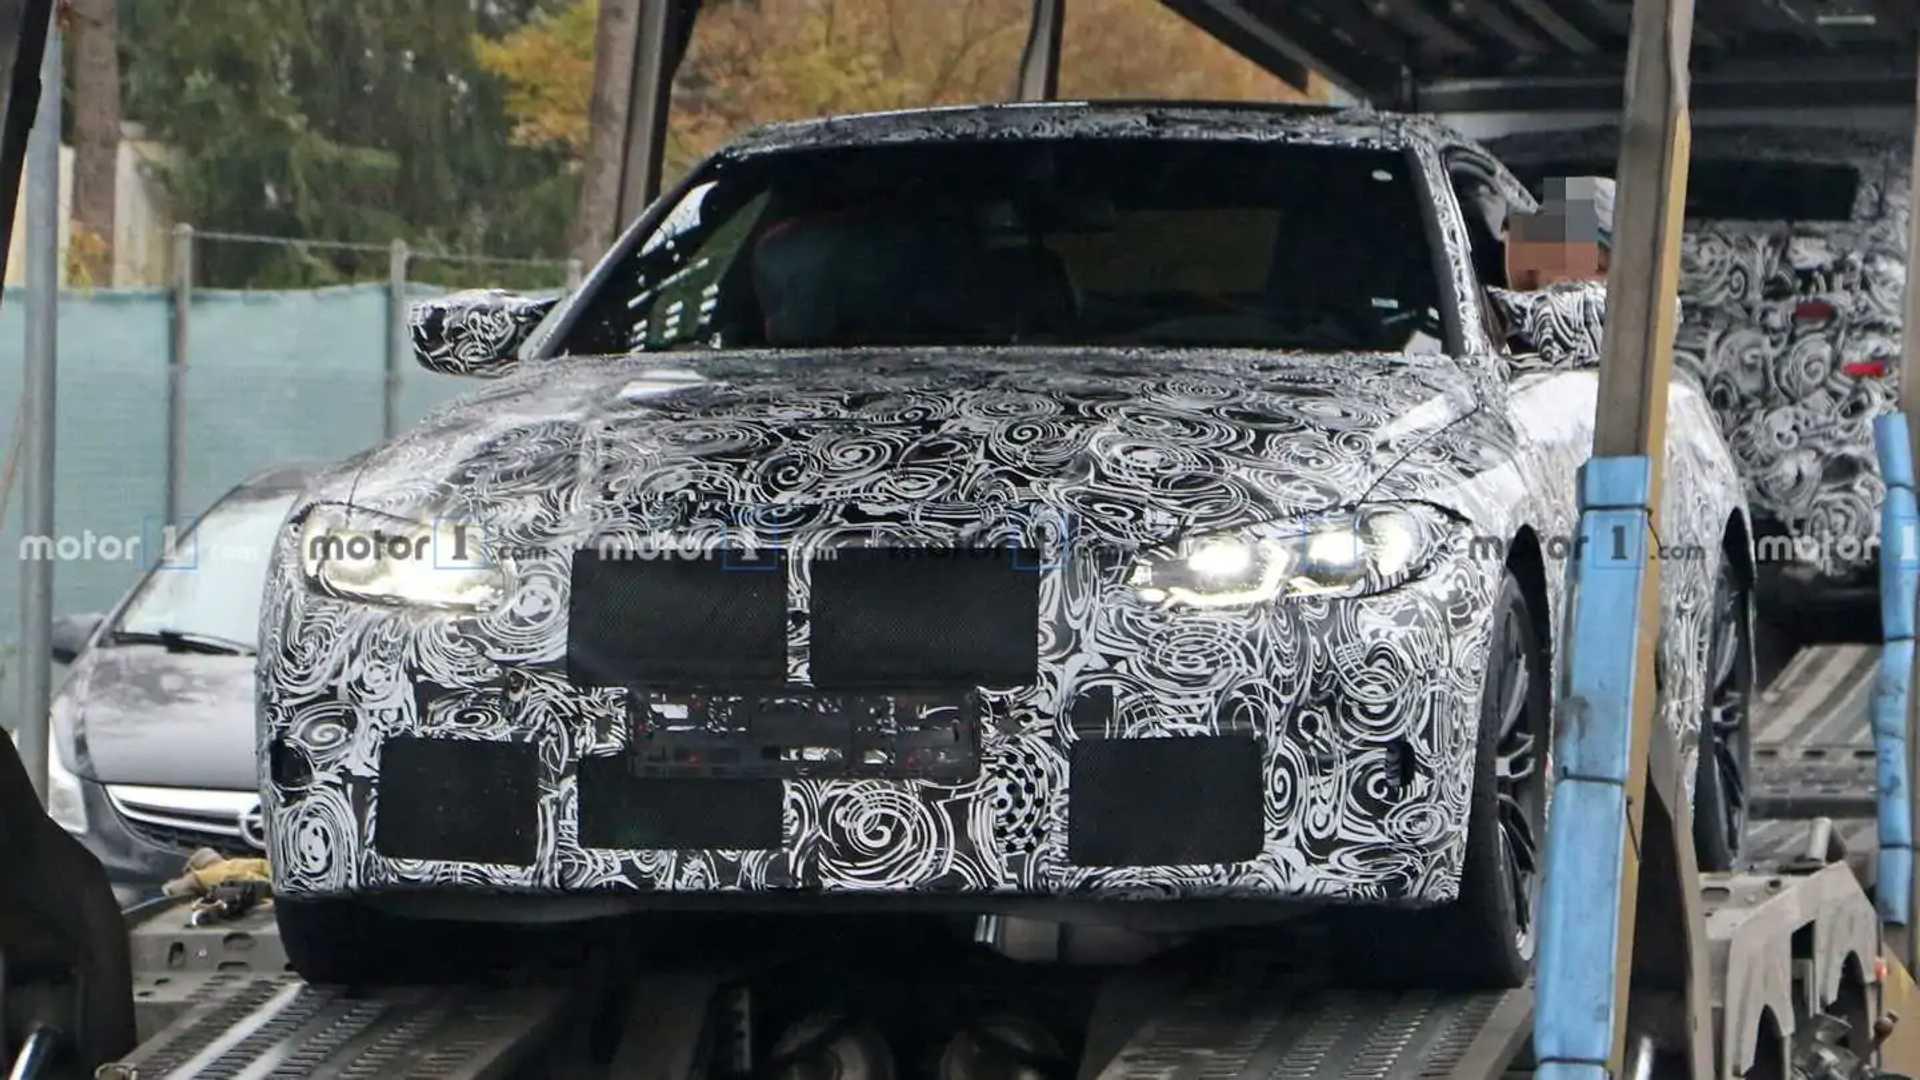 bmw m4 gt3 teaser confirms big grille  500 hp for production model